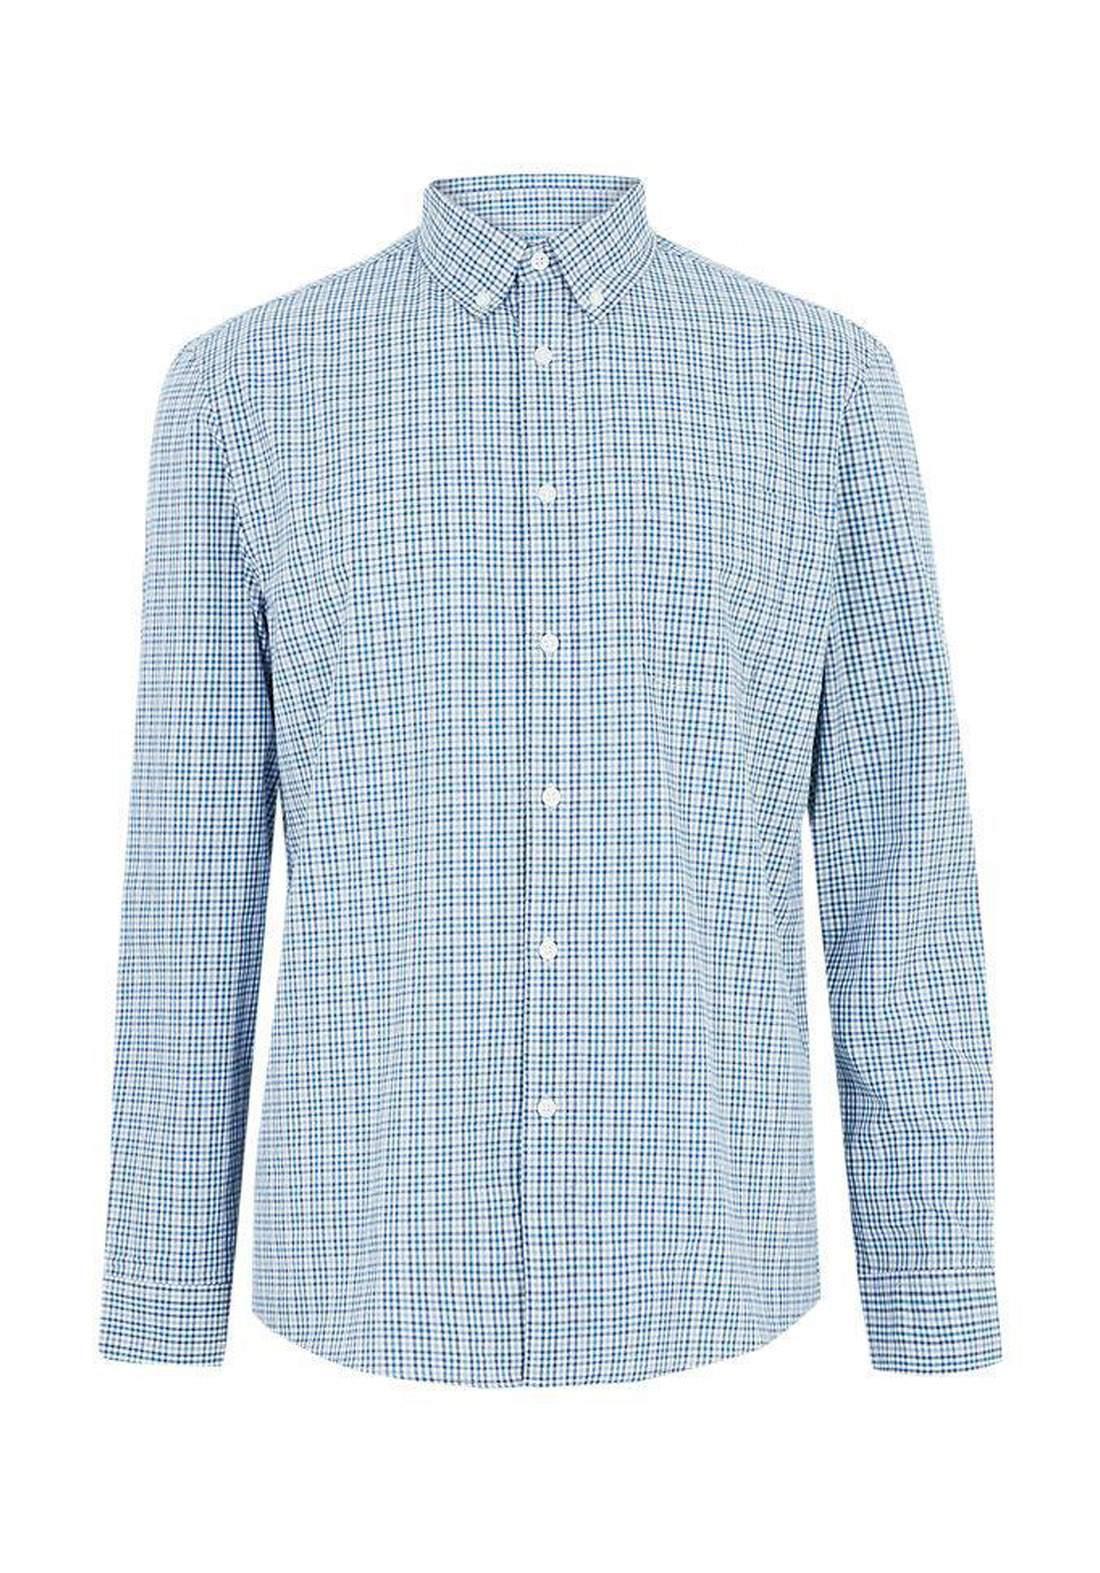 قميص رجالي بأكمام طويلة سمائي اللون من Marks and Spenser